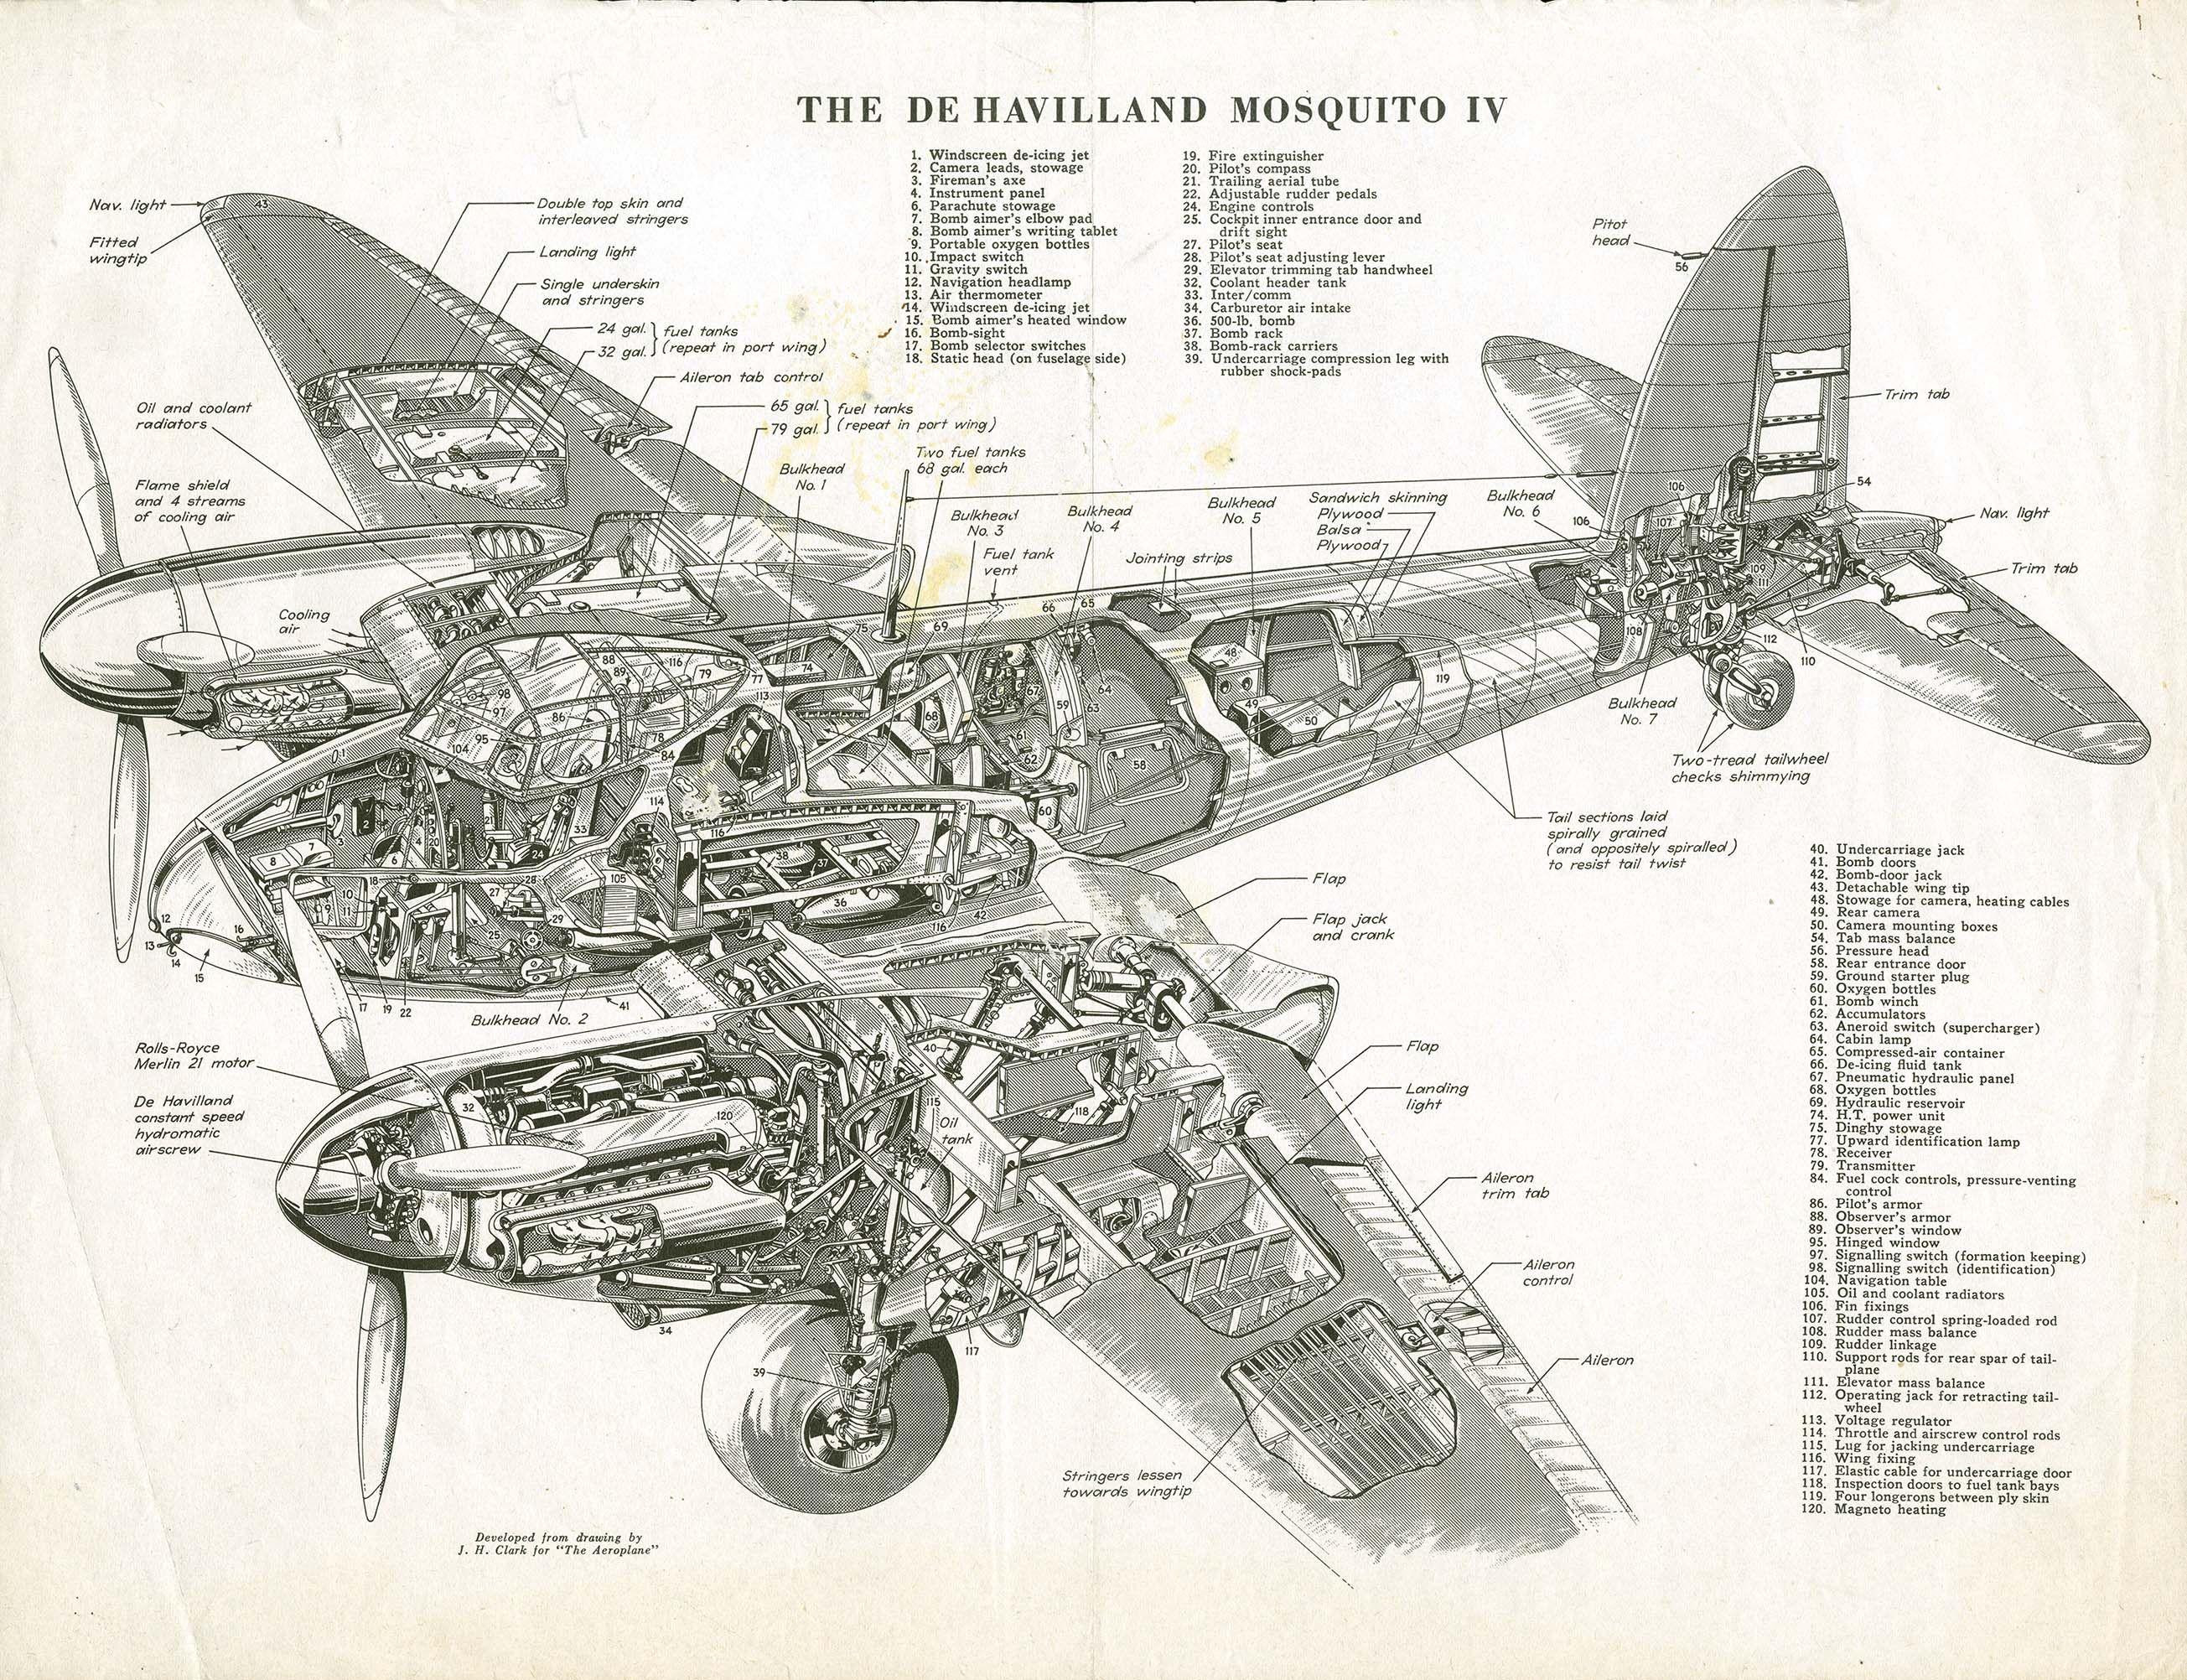 General Aviation Scale Diagram Ford Falcon Au Stereo Wiring The De Havilland Mosquito V История авиации 5